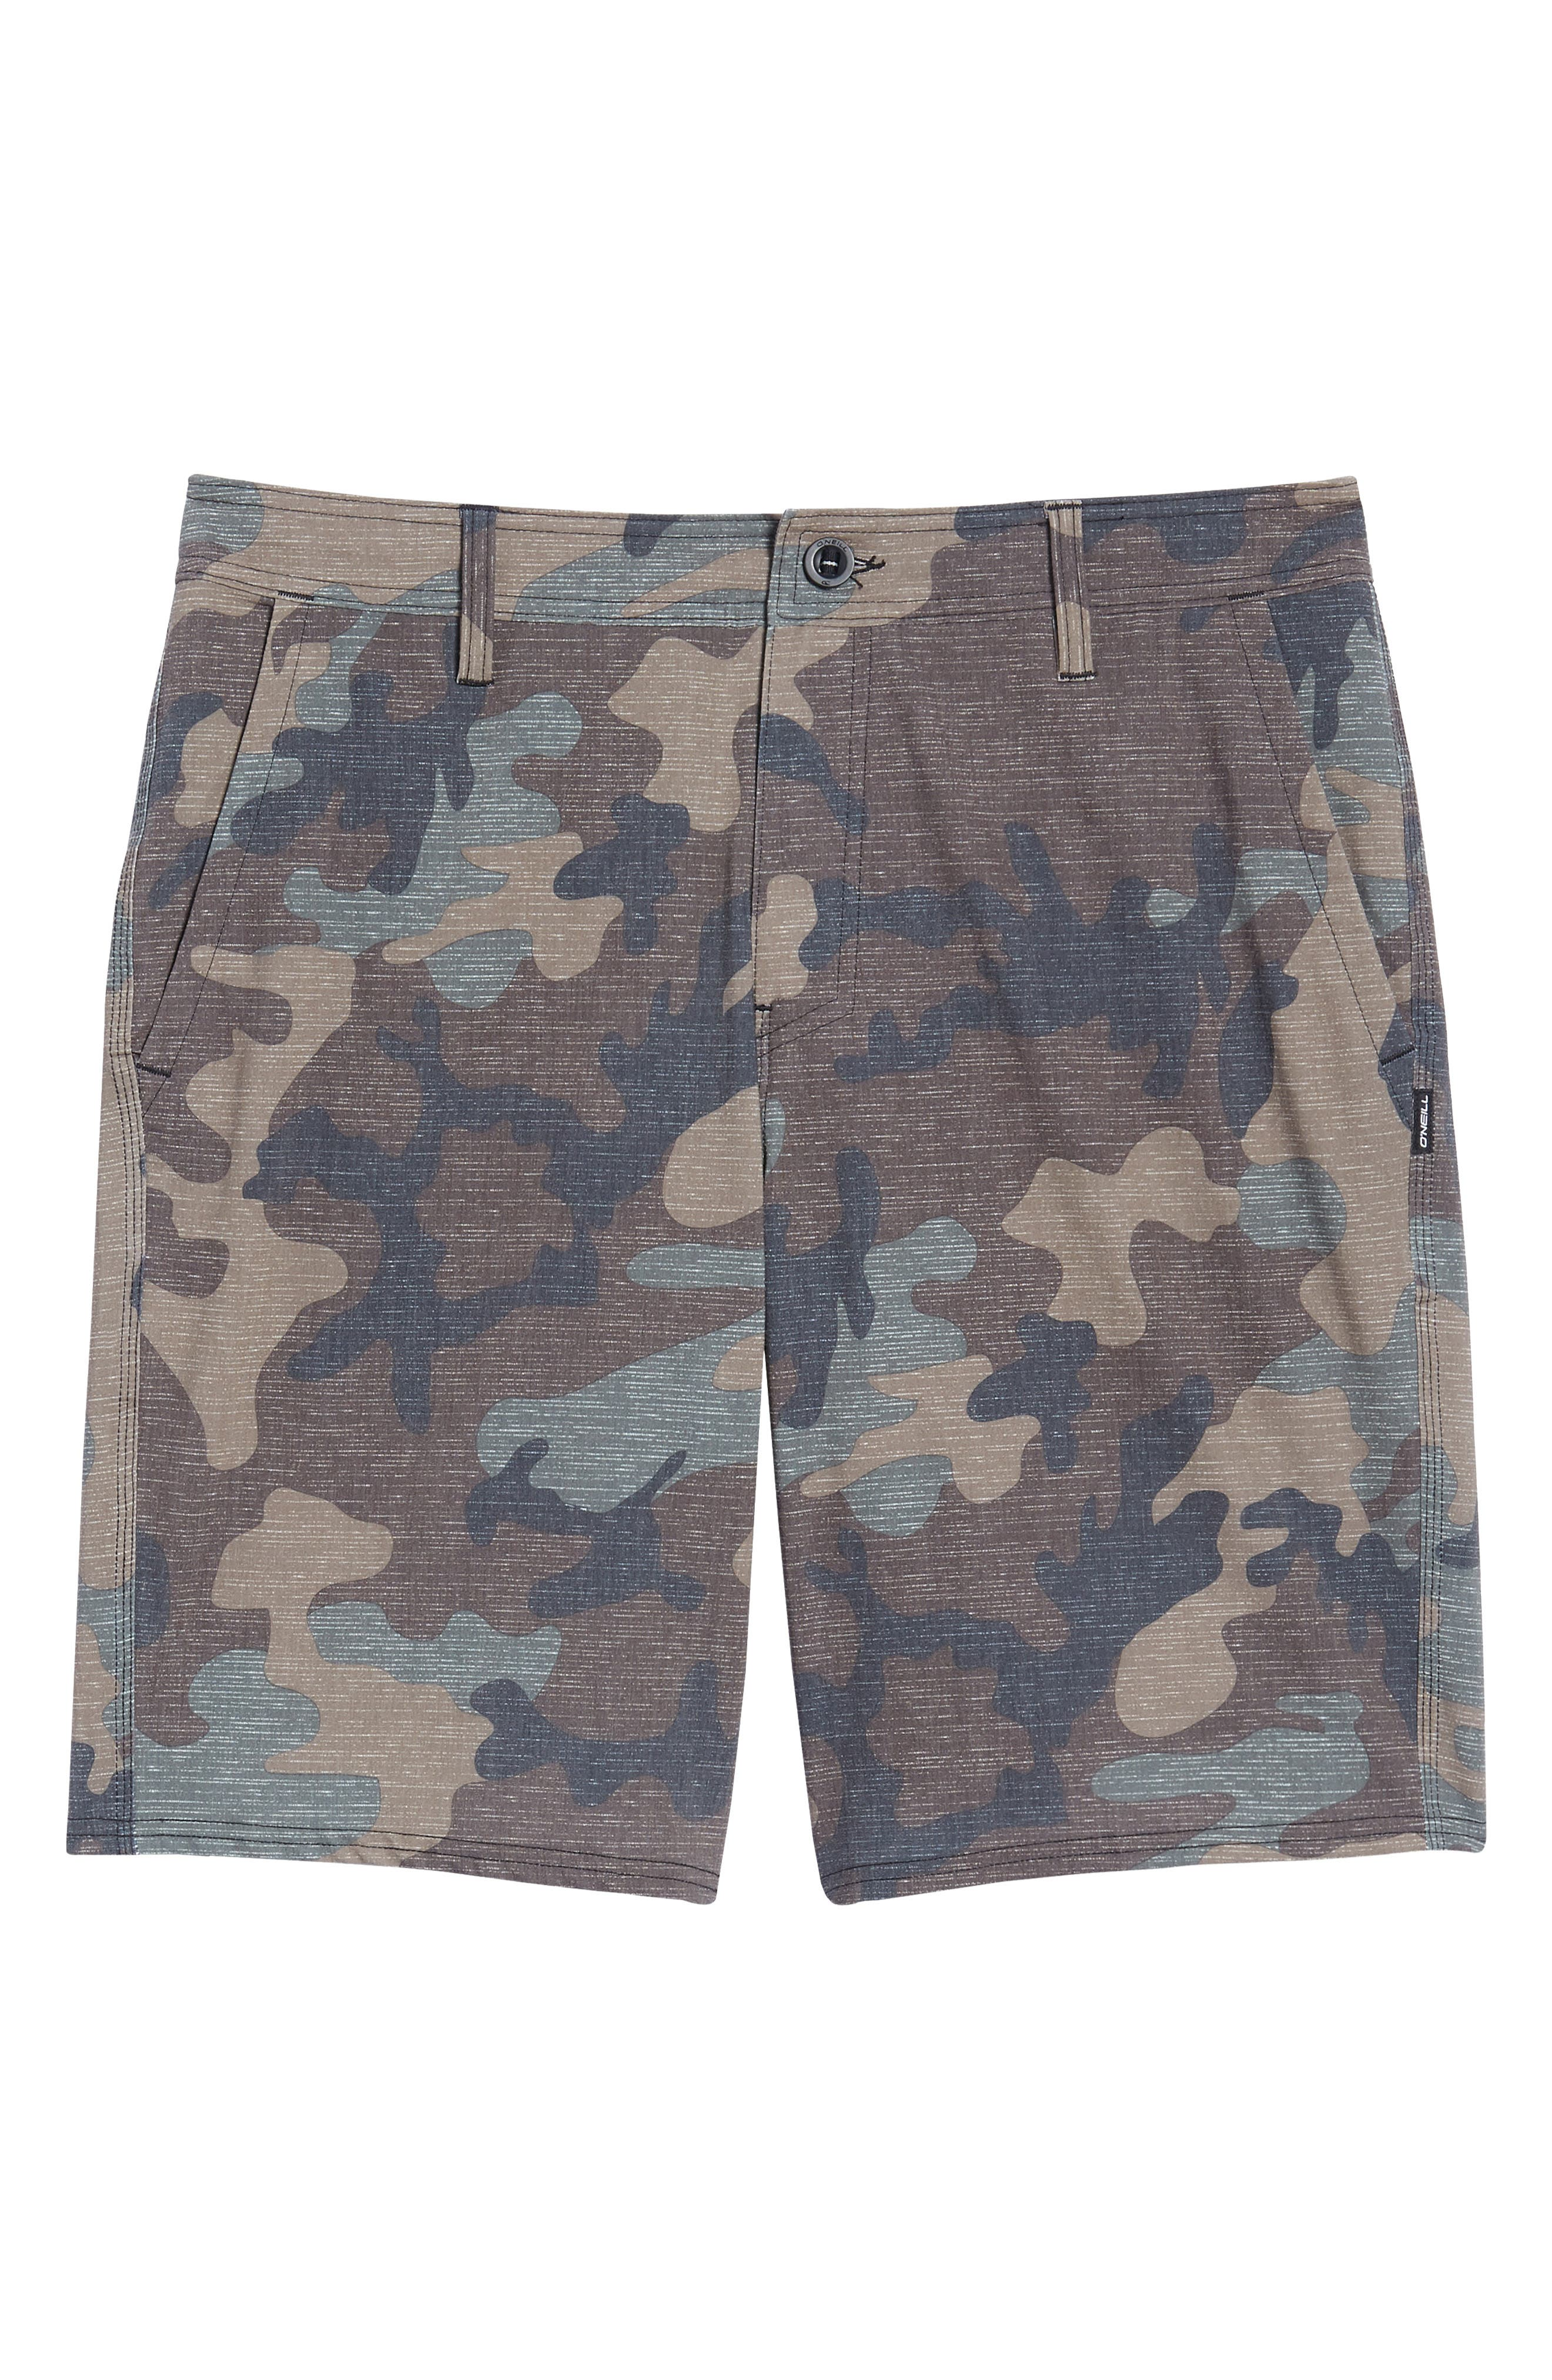 Mixed Hybrid Shorts,                             Alternate thumbnail 6, color,                             Camo